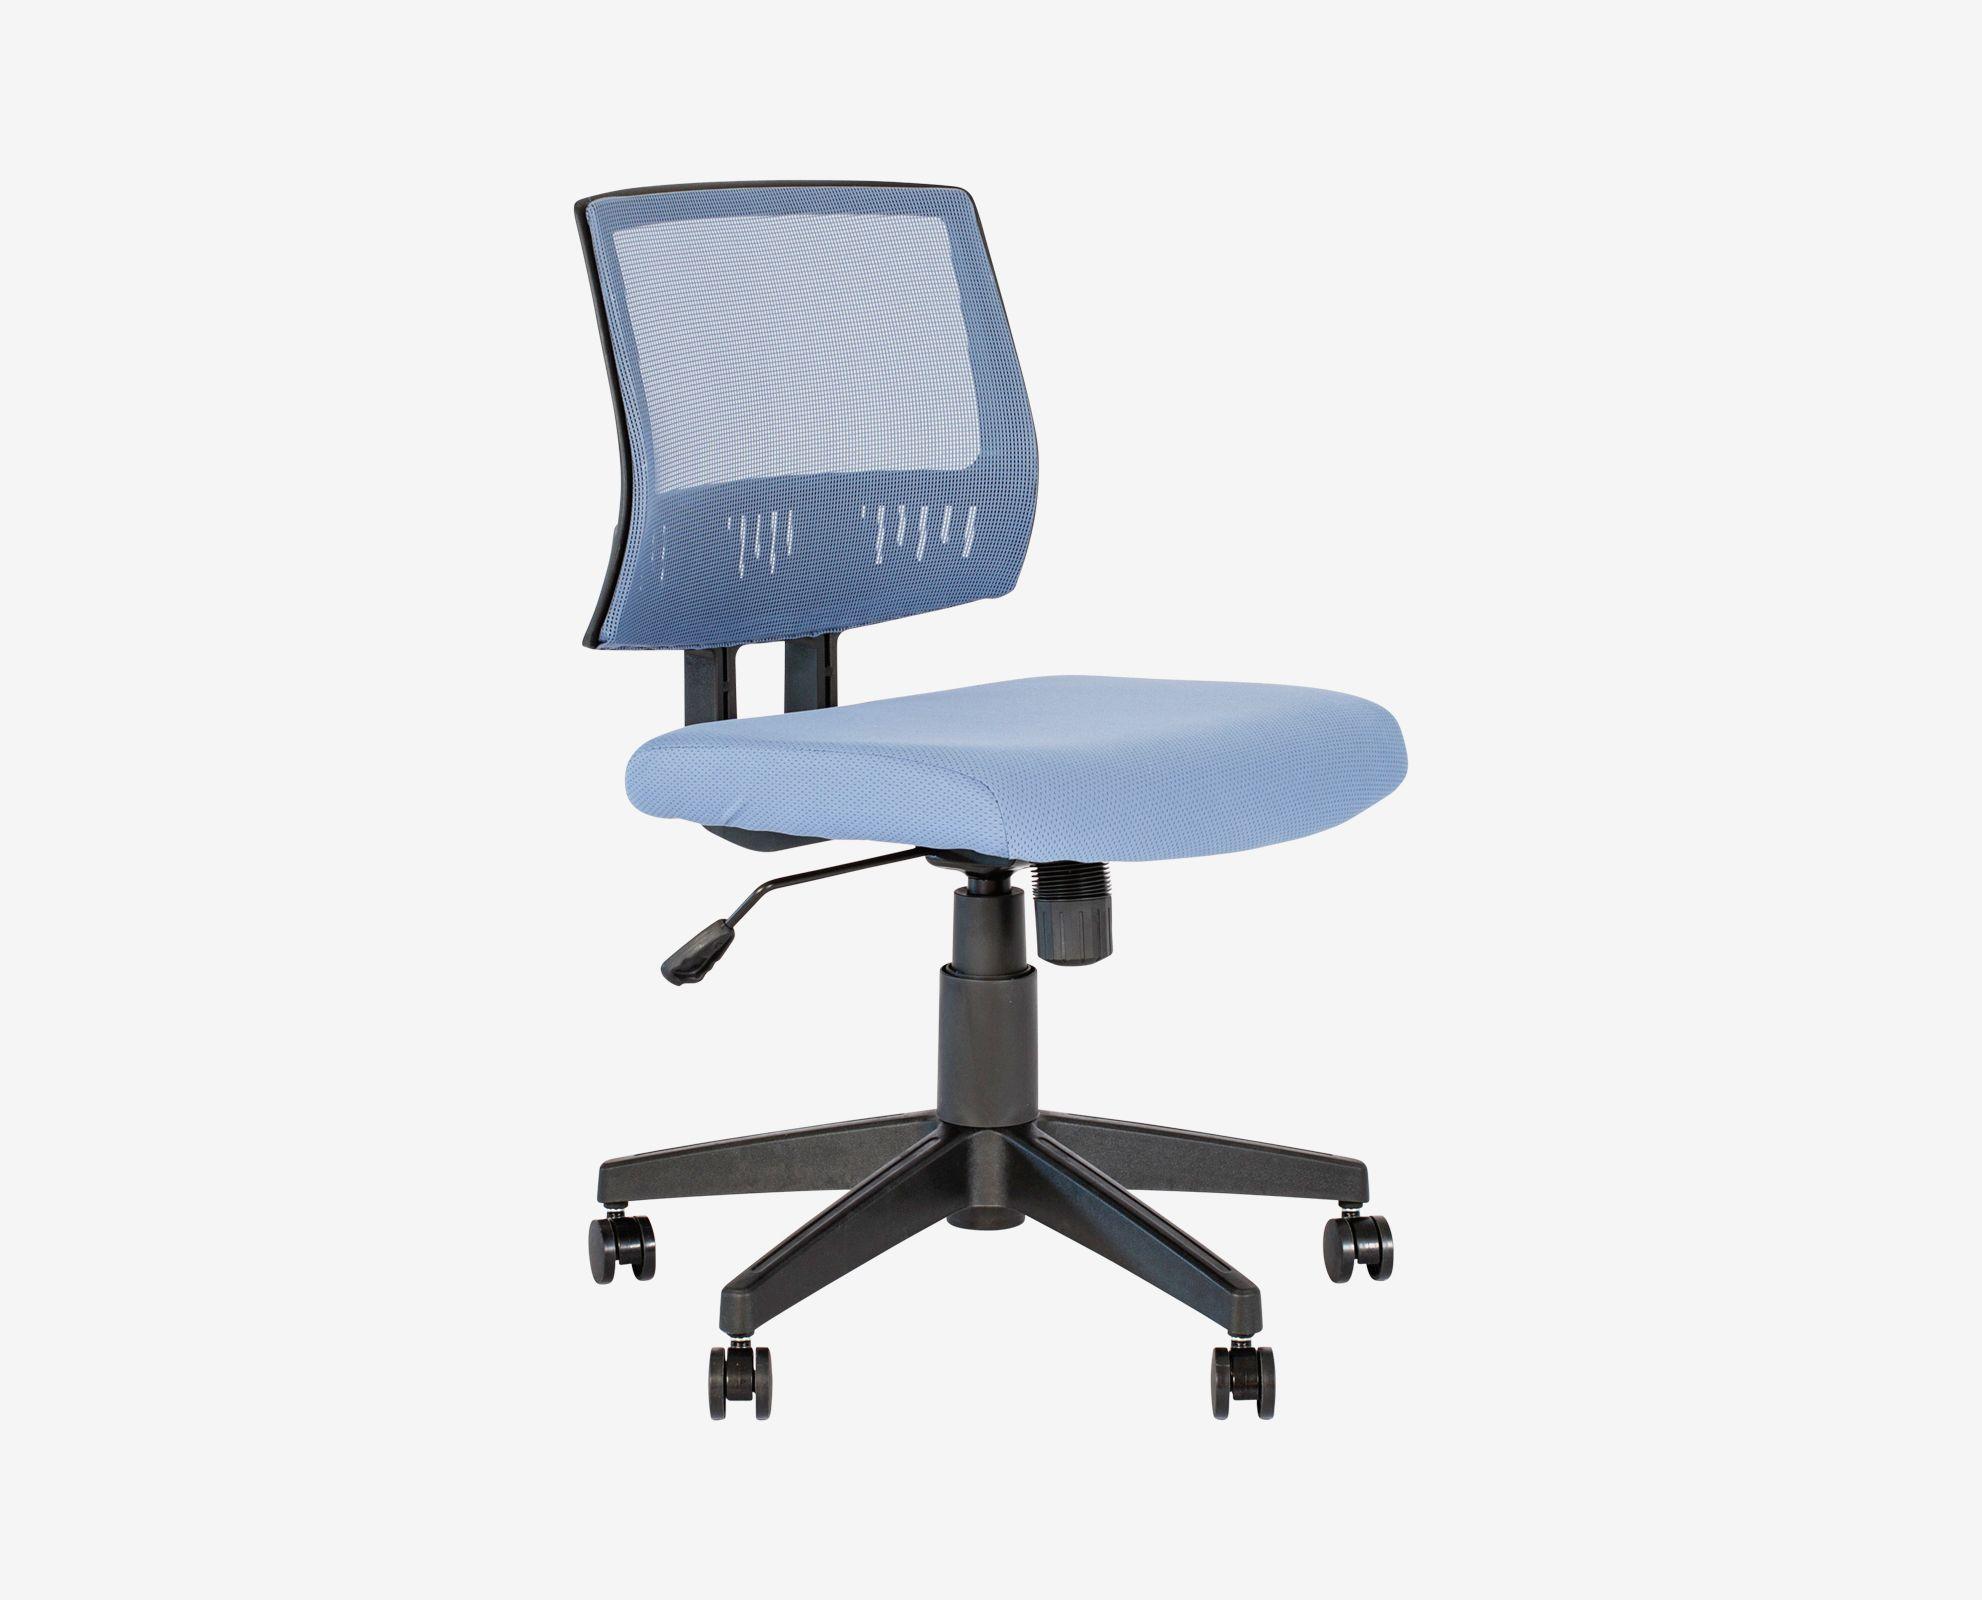 Sweety Desk Chair Chairs Scandinavian Designs Chair Desk Chair Design